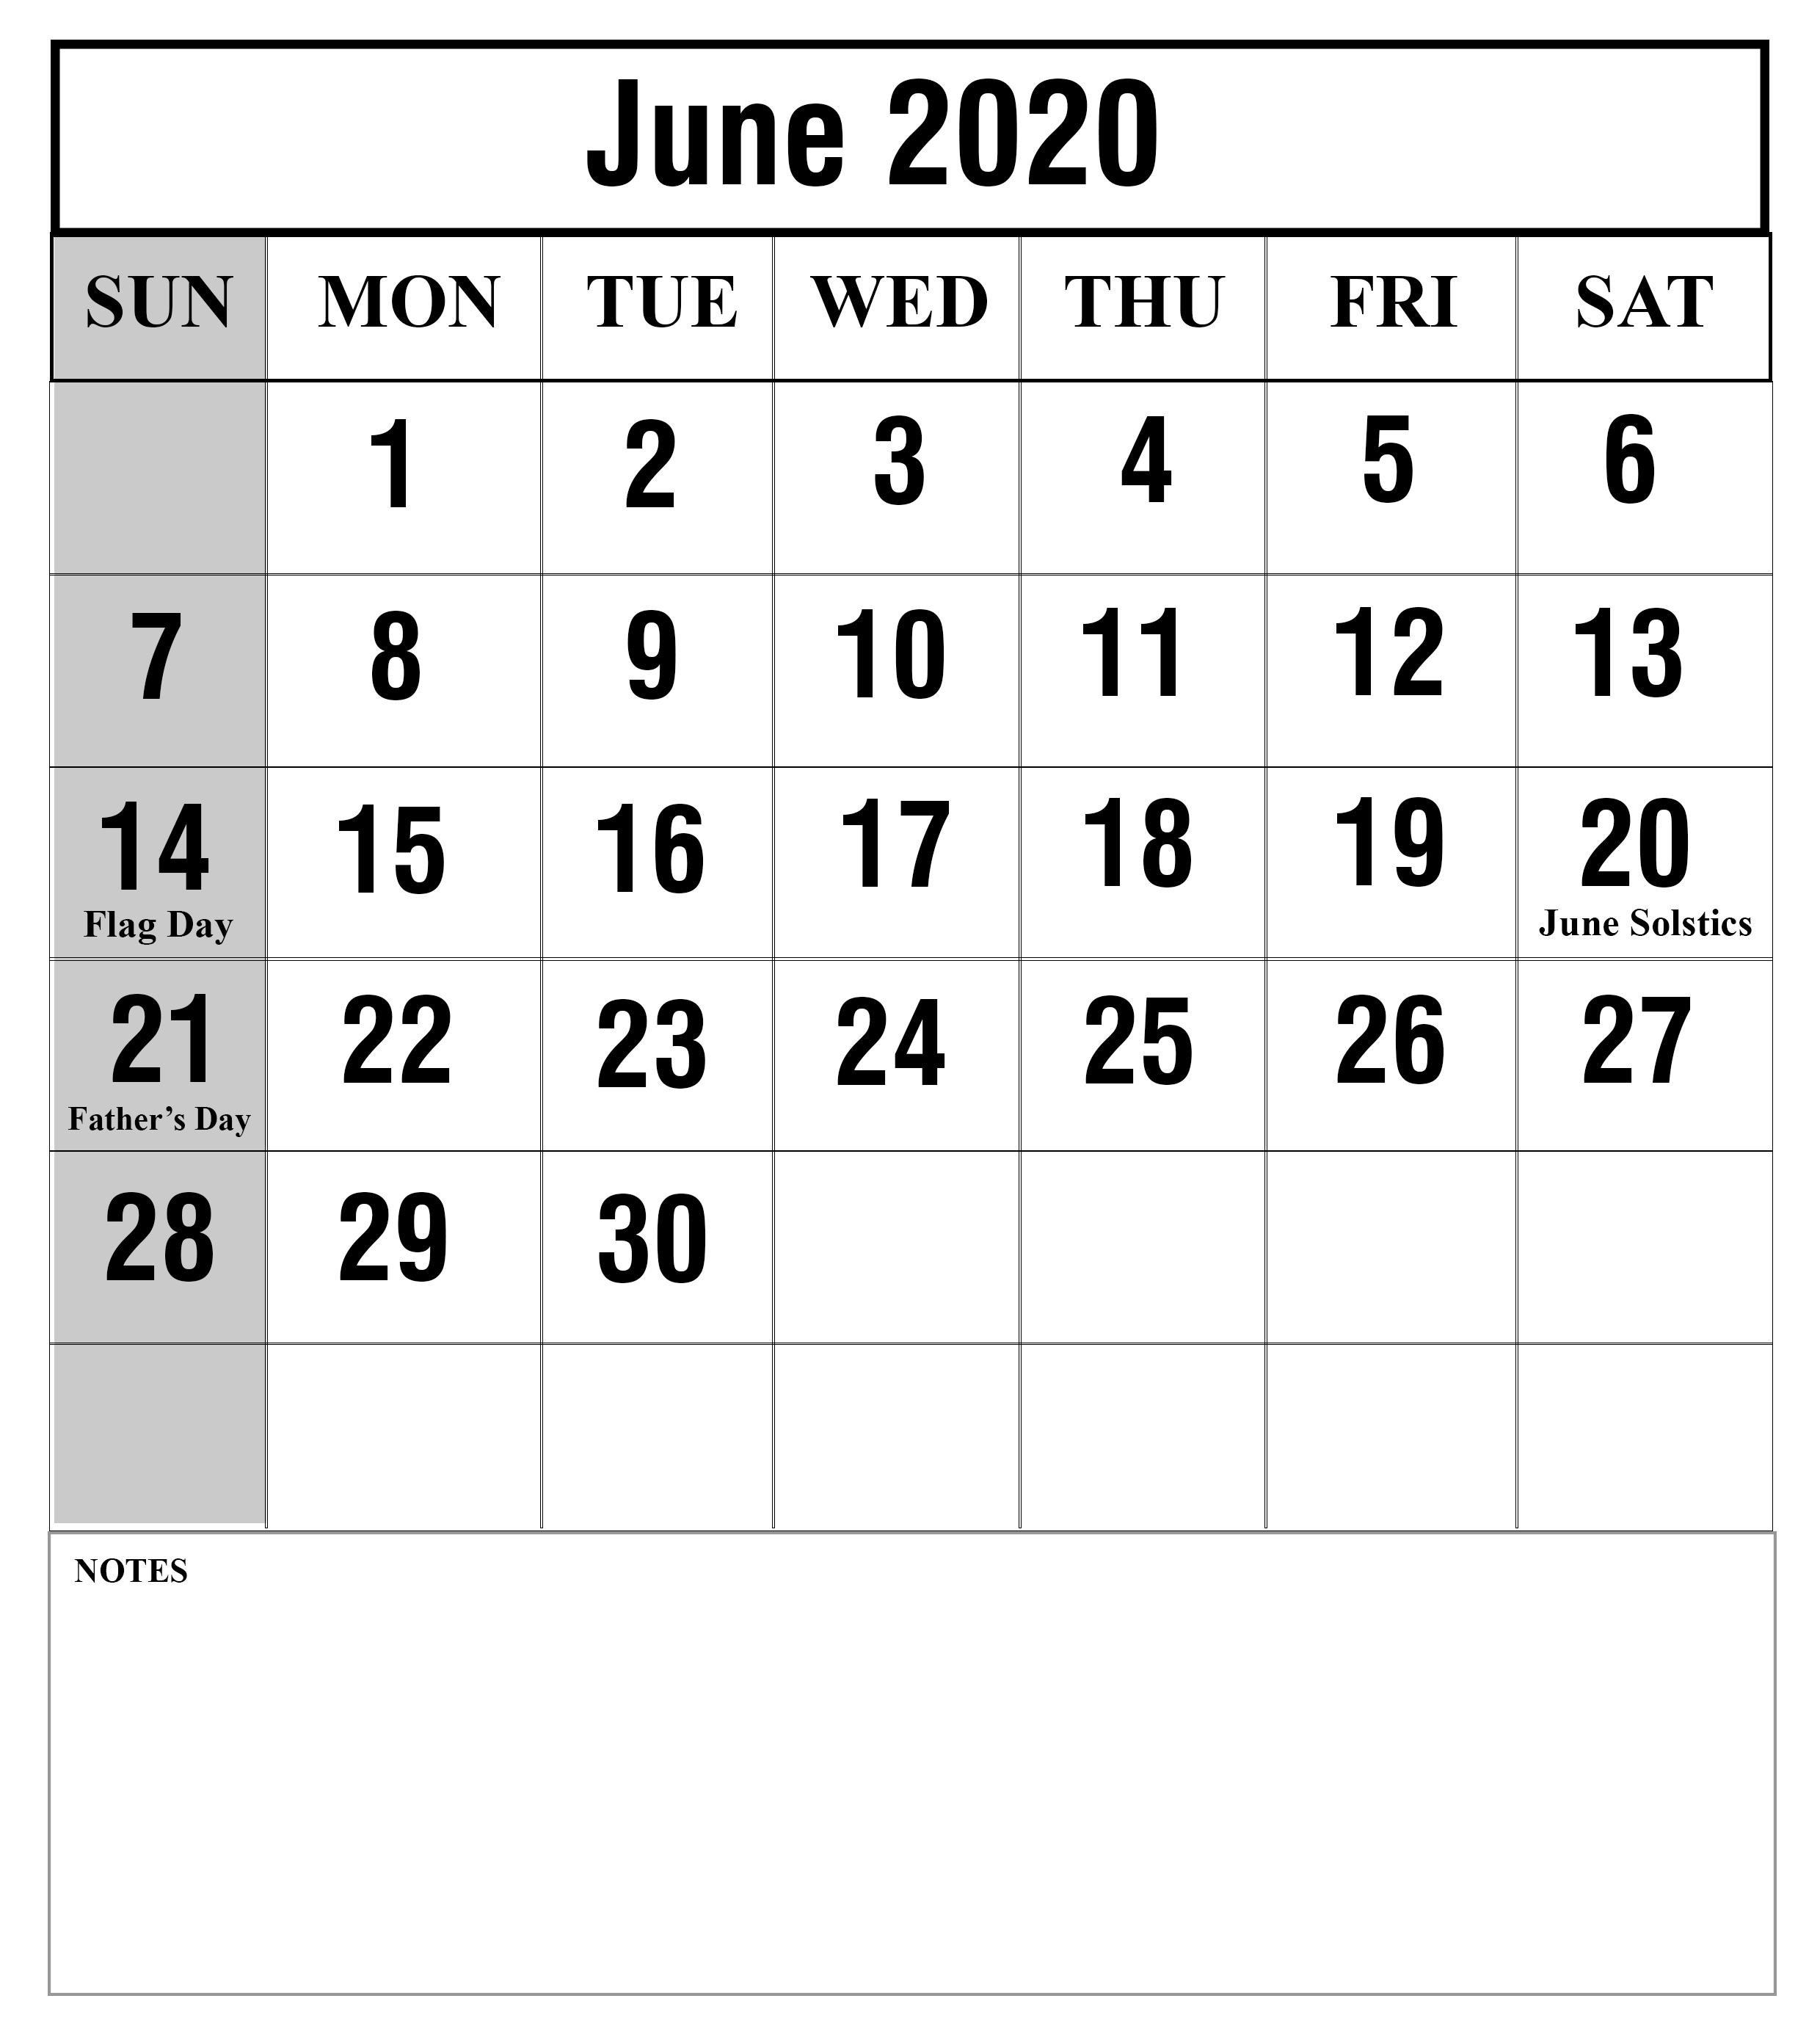 15+ June 2020 Printable Calendar Free To Customize